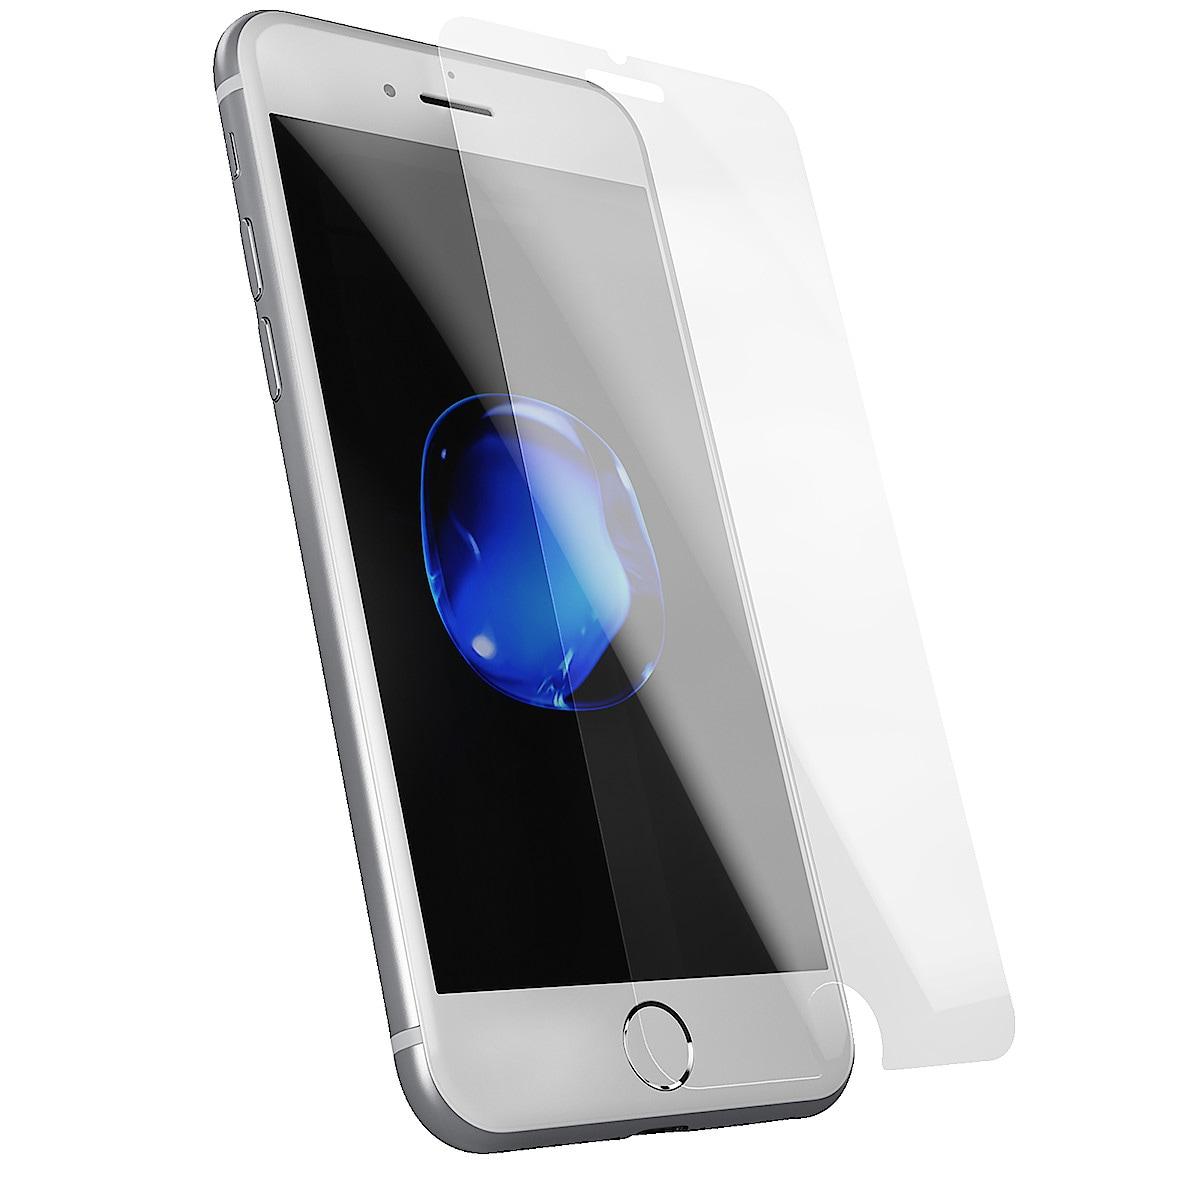 Skärmskydd för iPhone 8 Plus Holdit Tempered Glass